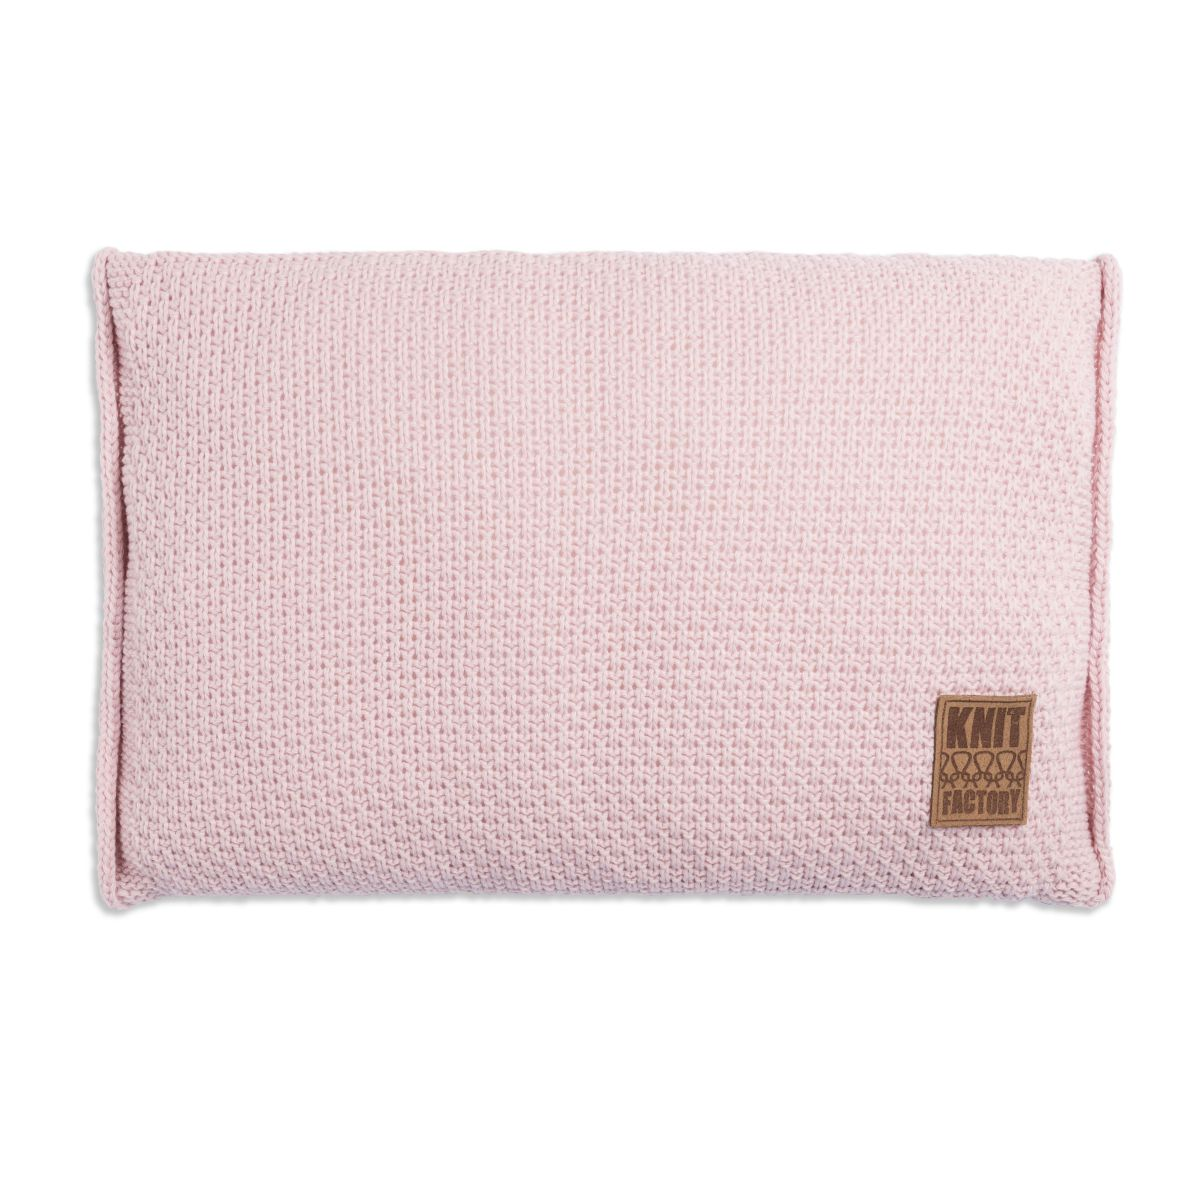 jesse cushion pink 60x40